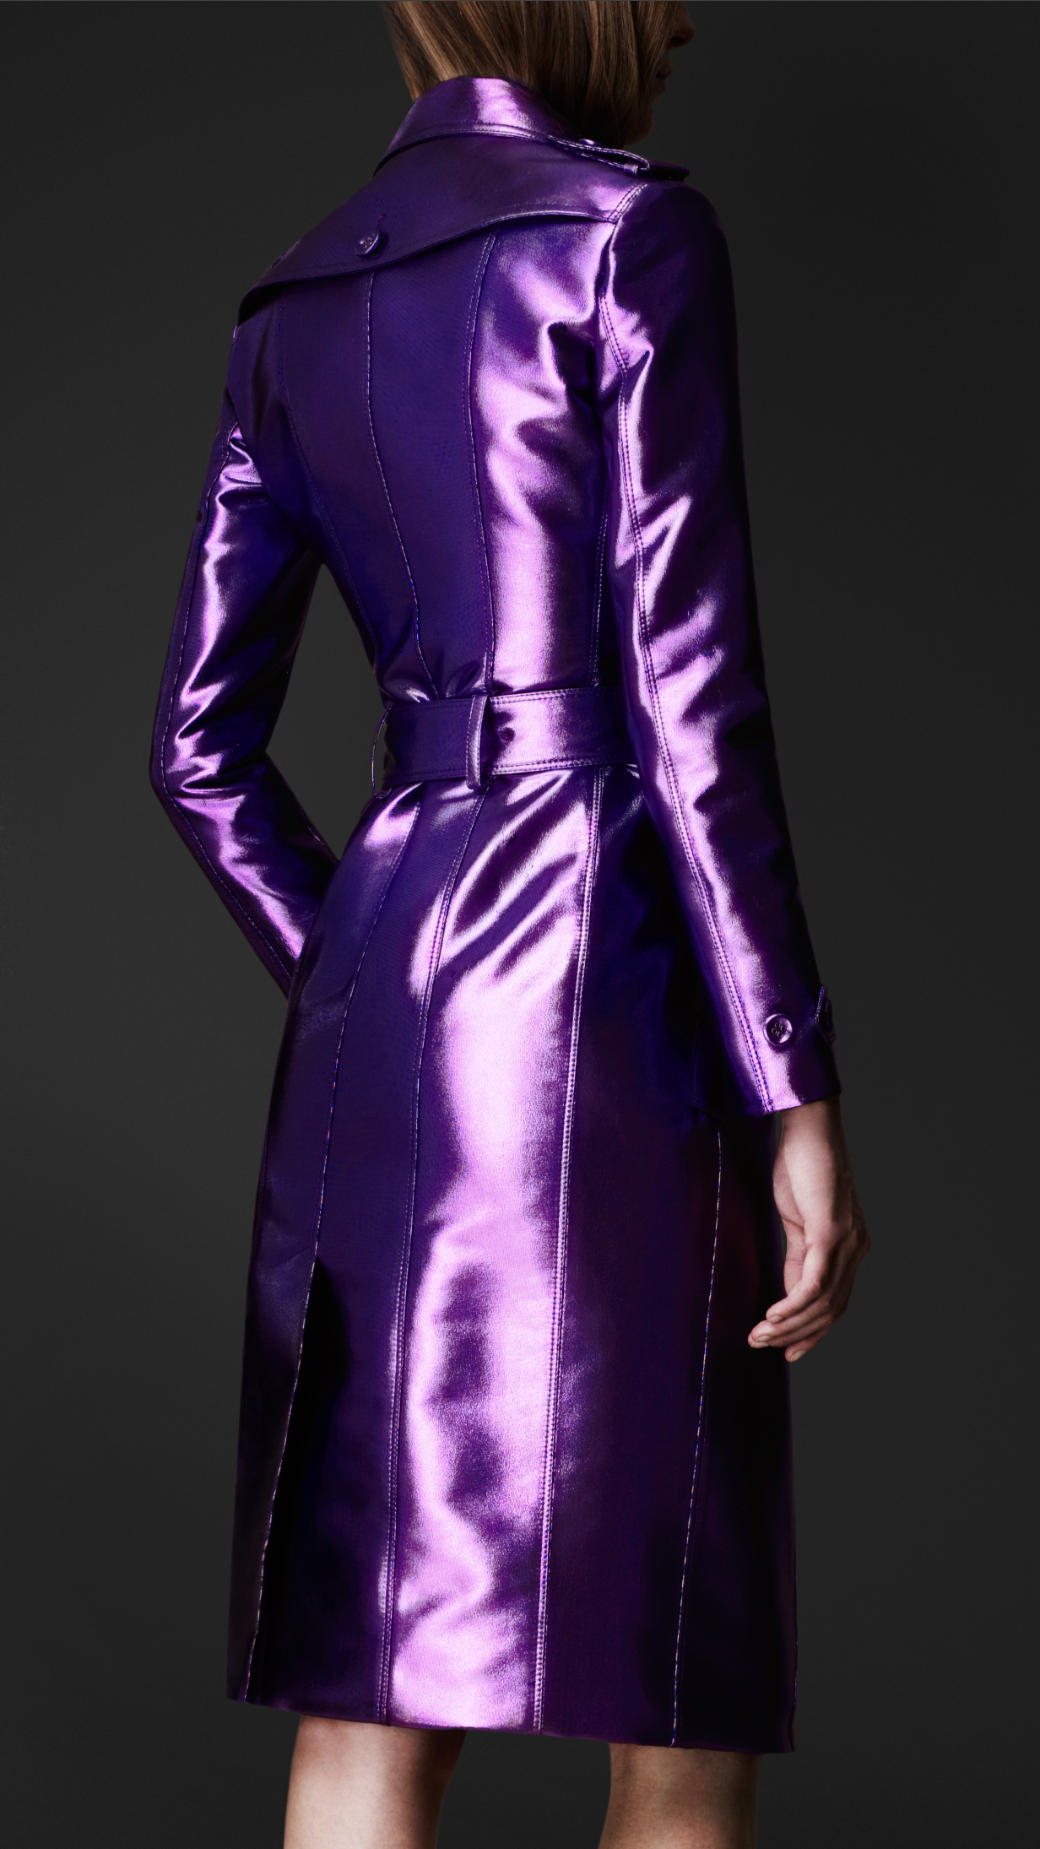 Lyst Burberry Prorsum Bright Metallic Trench Coat In Purple